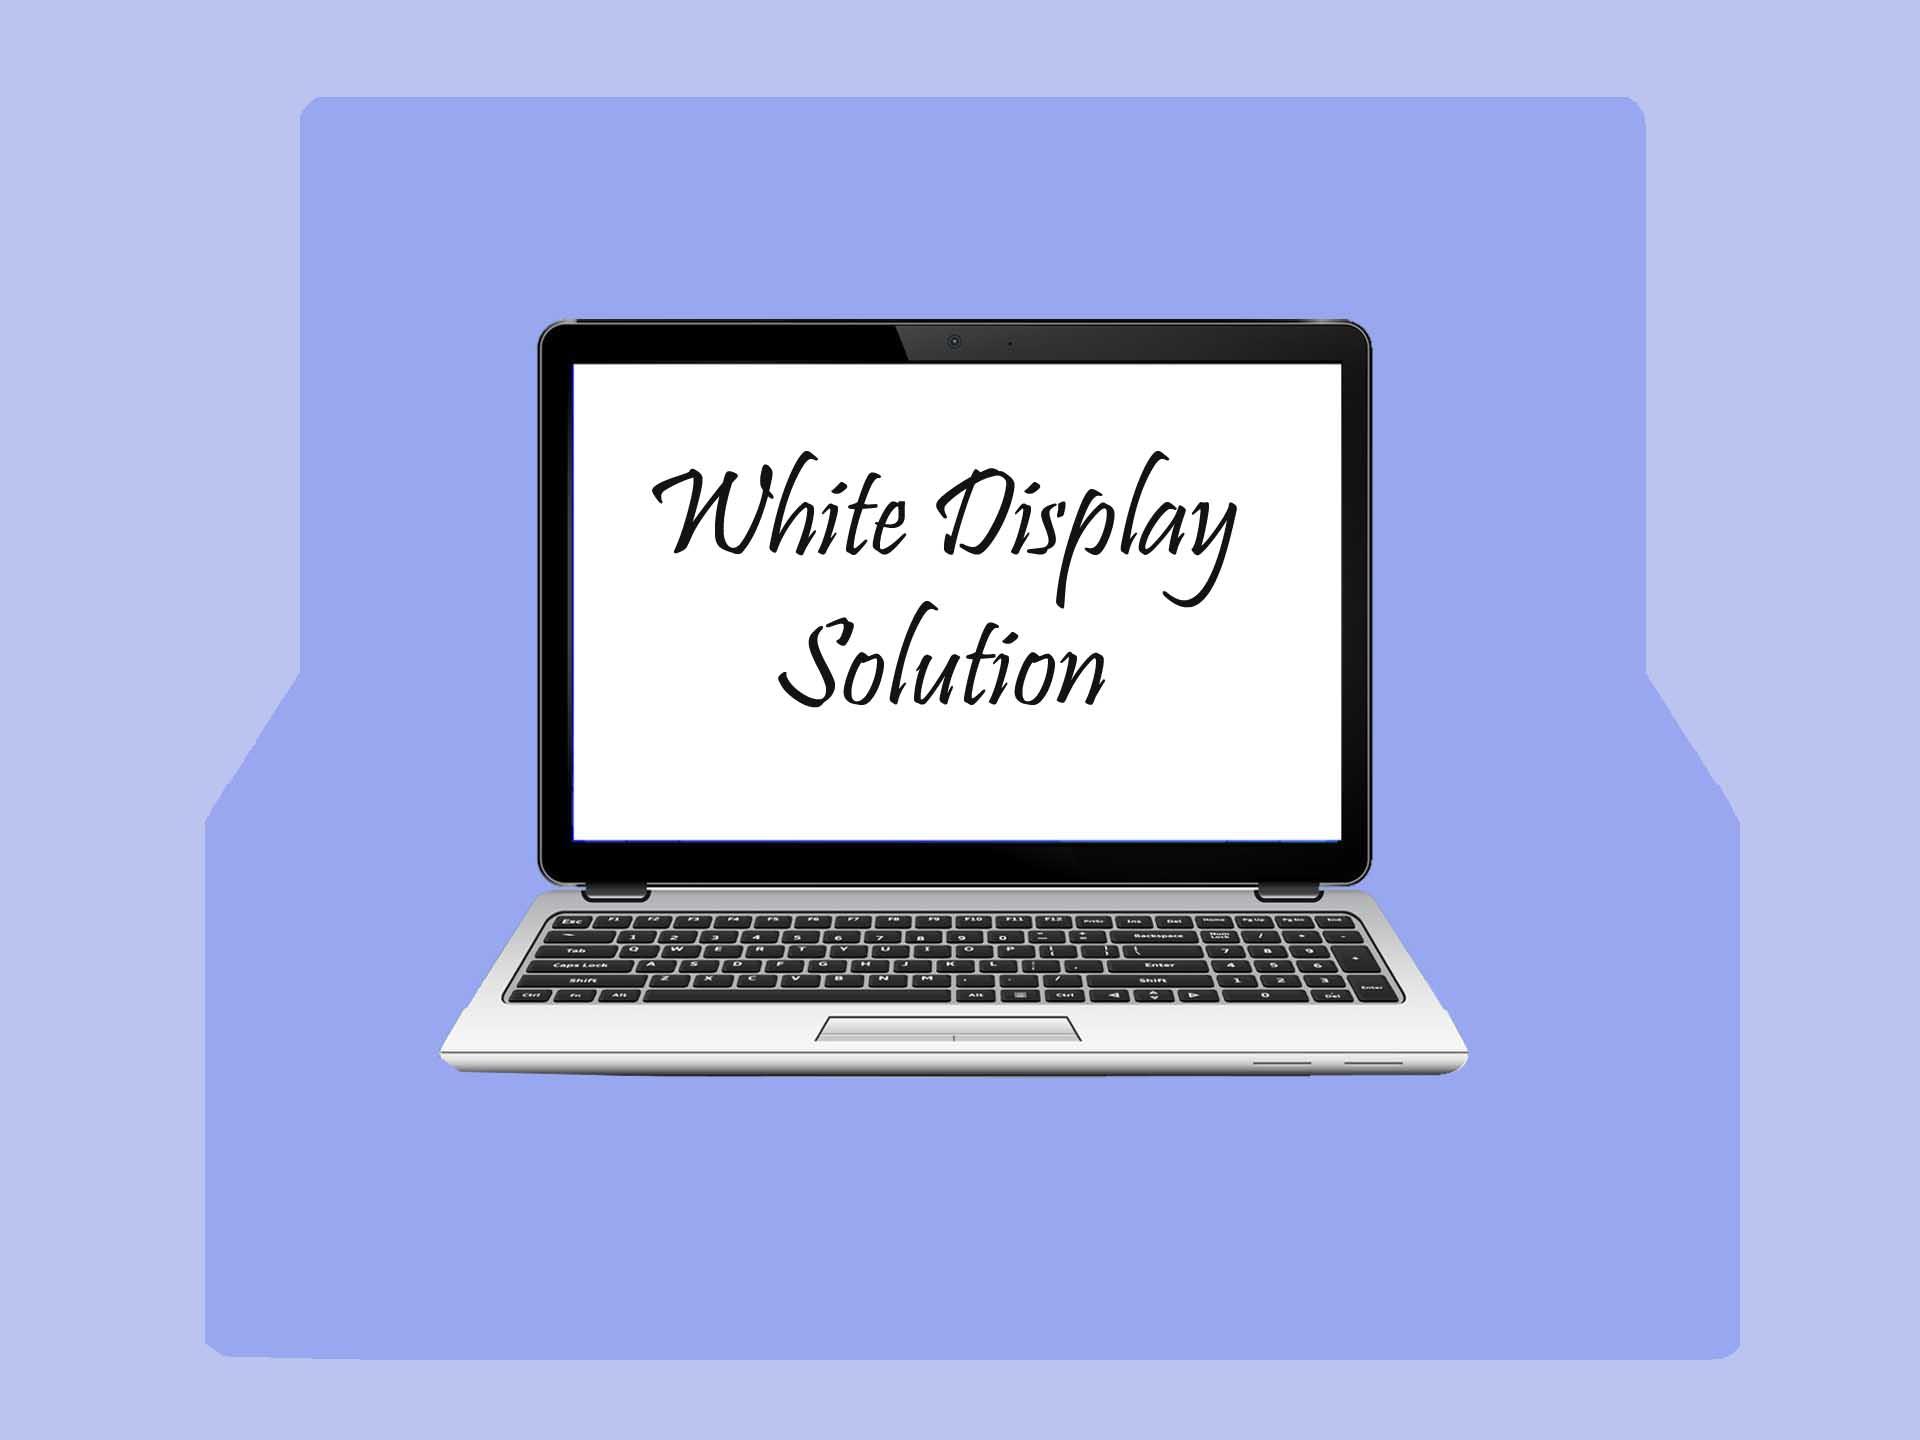 Laptop White Display Solution-ল্যাপটপের ডিসপ্লে স্ক্রিন সাদা সমস্যা